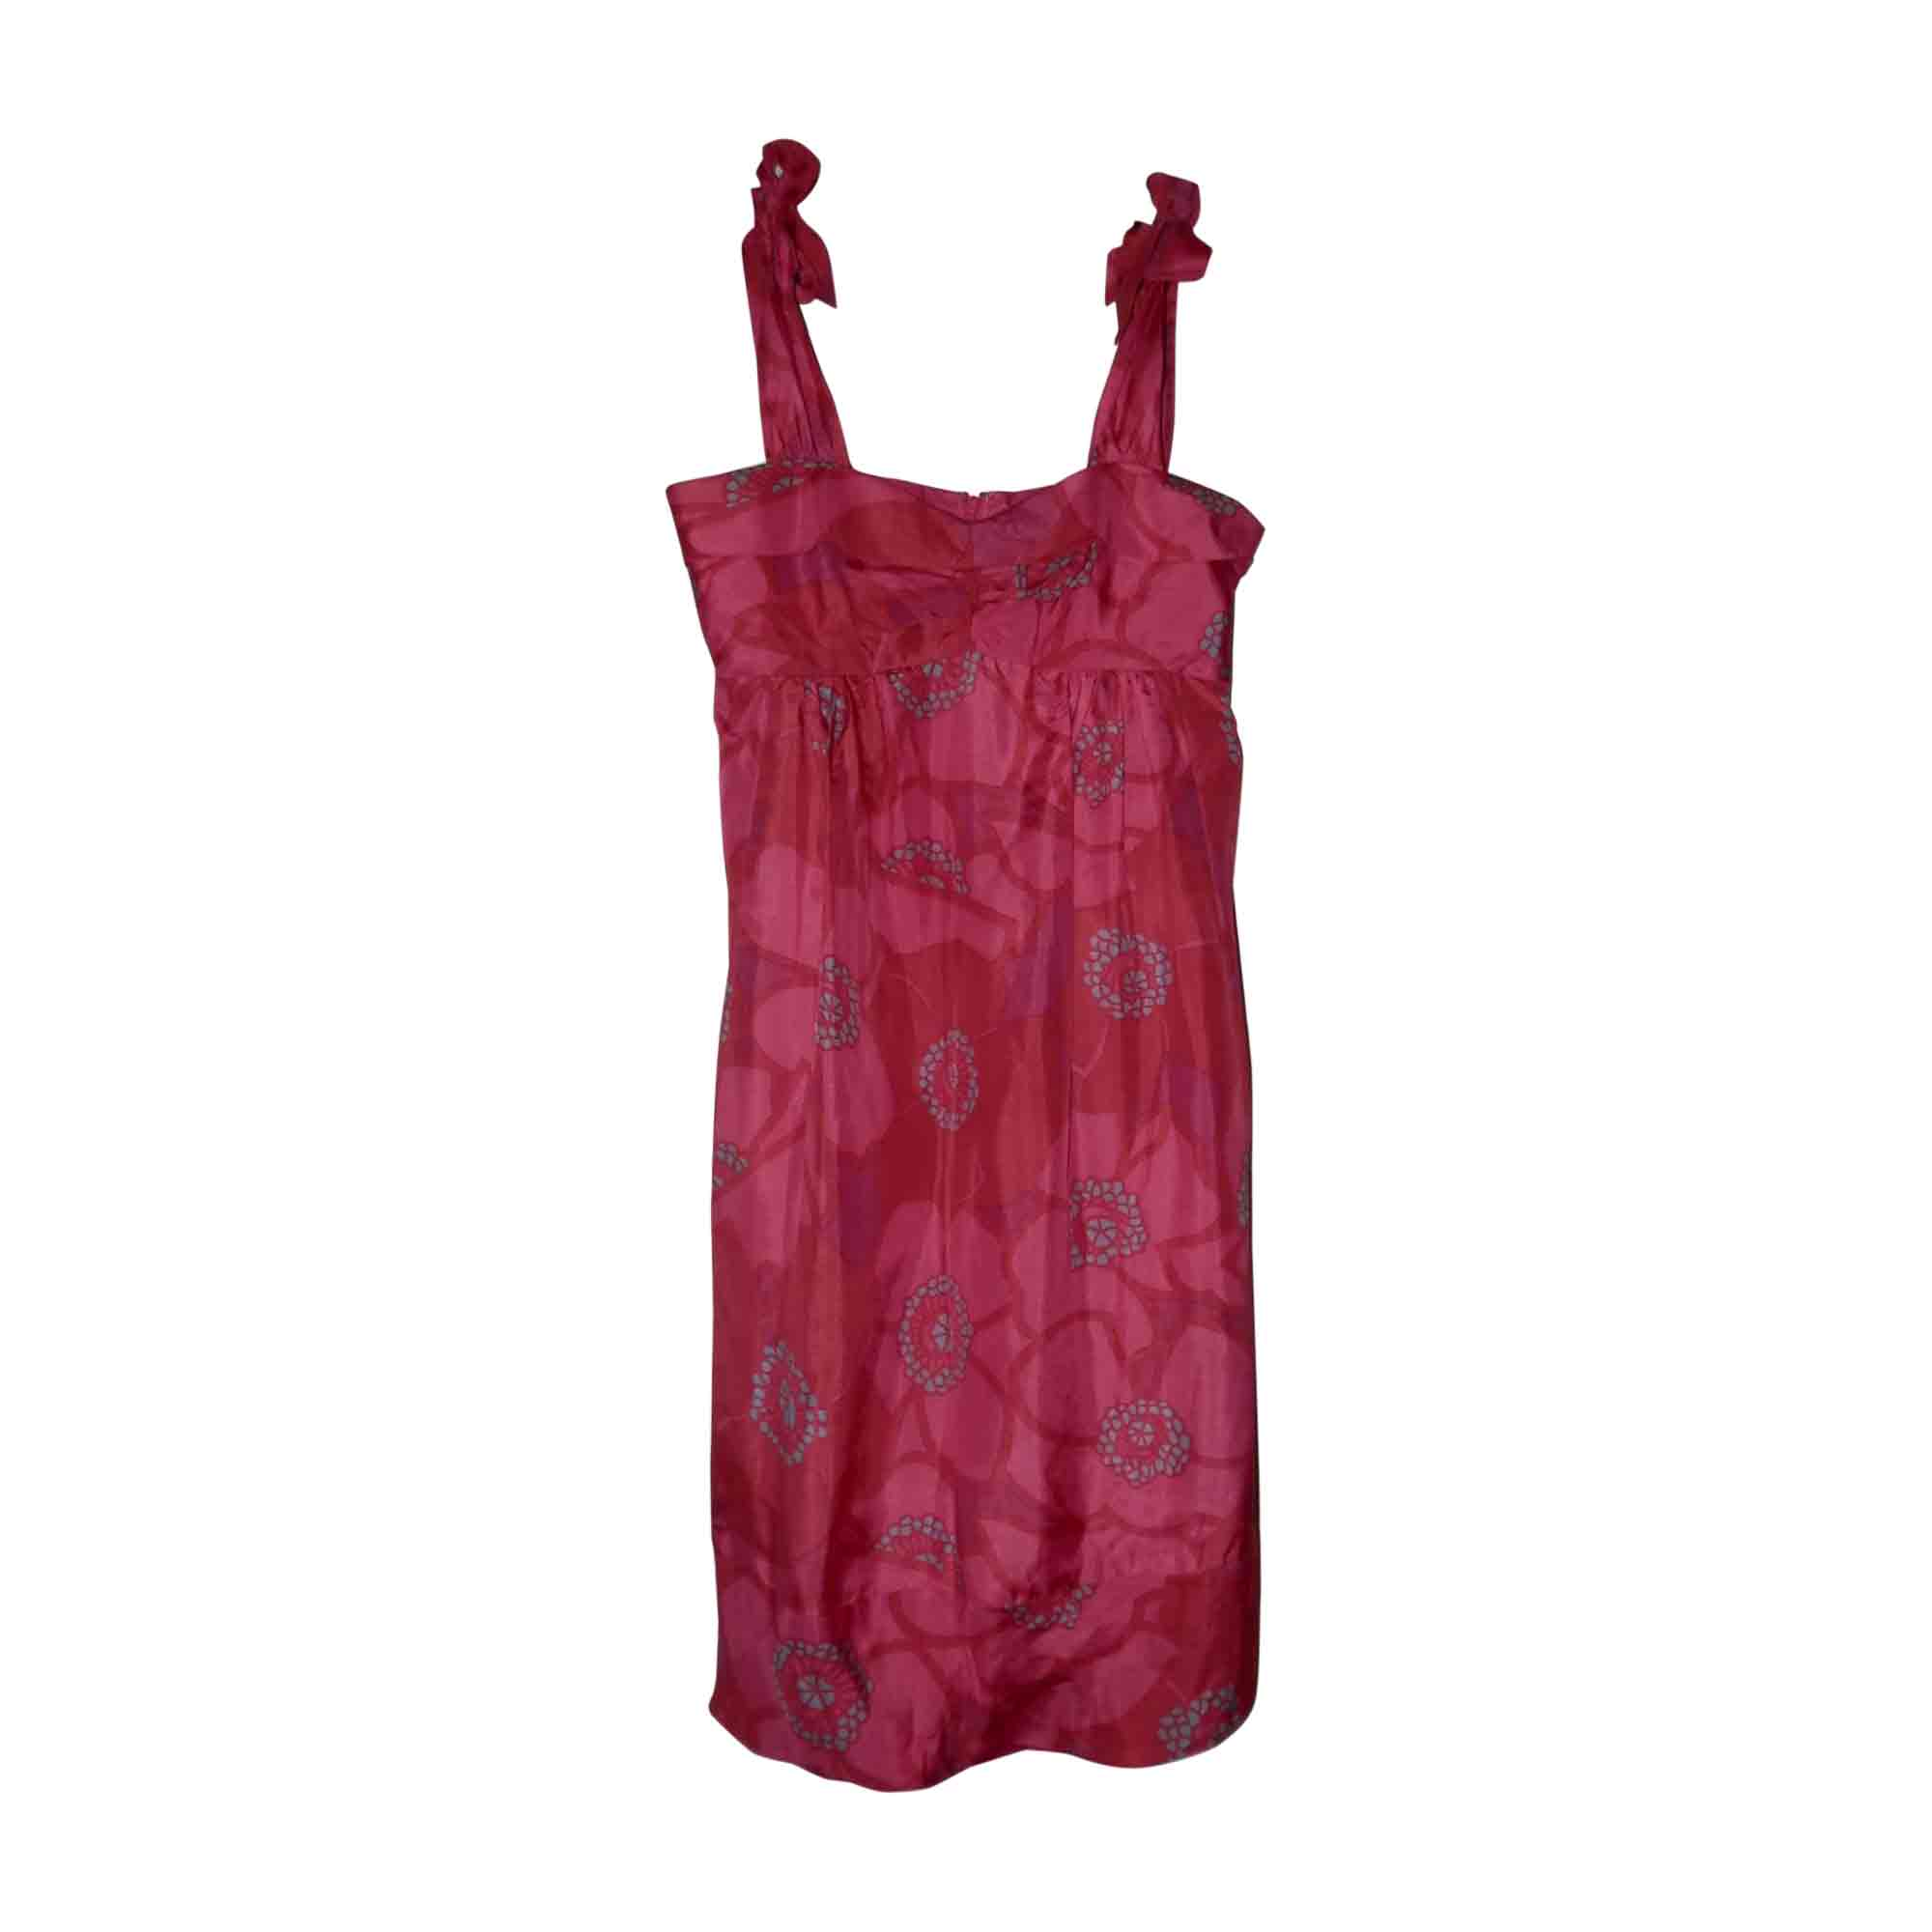 Robe mi-longue MARC JACOBS Rose, fuschia, vieux rose